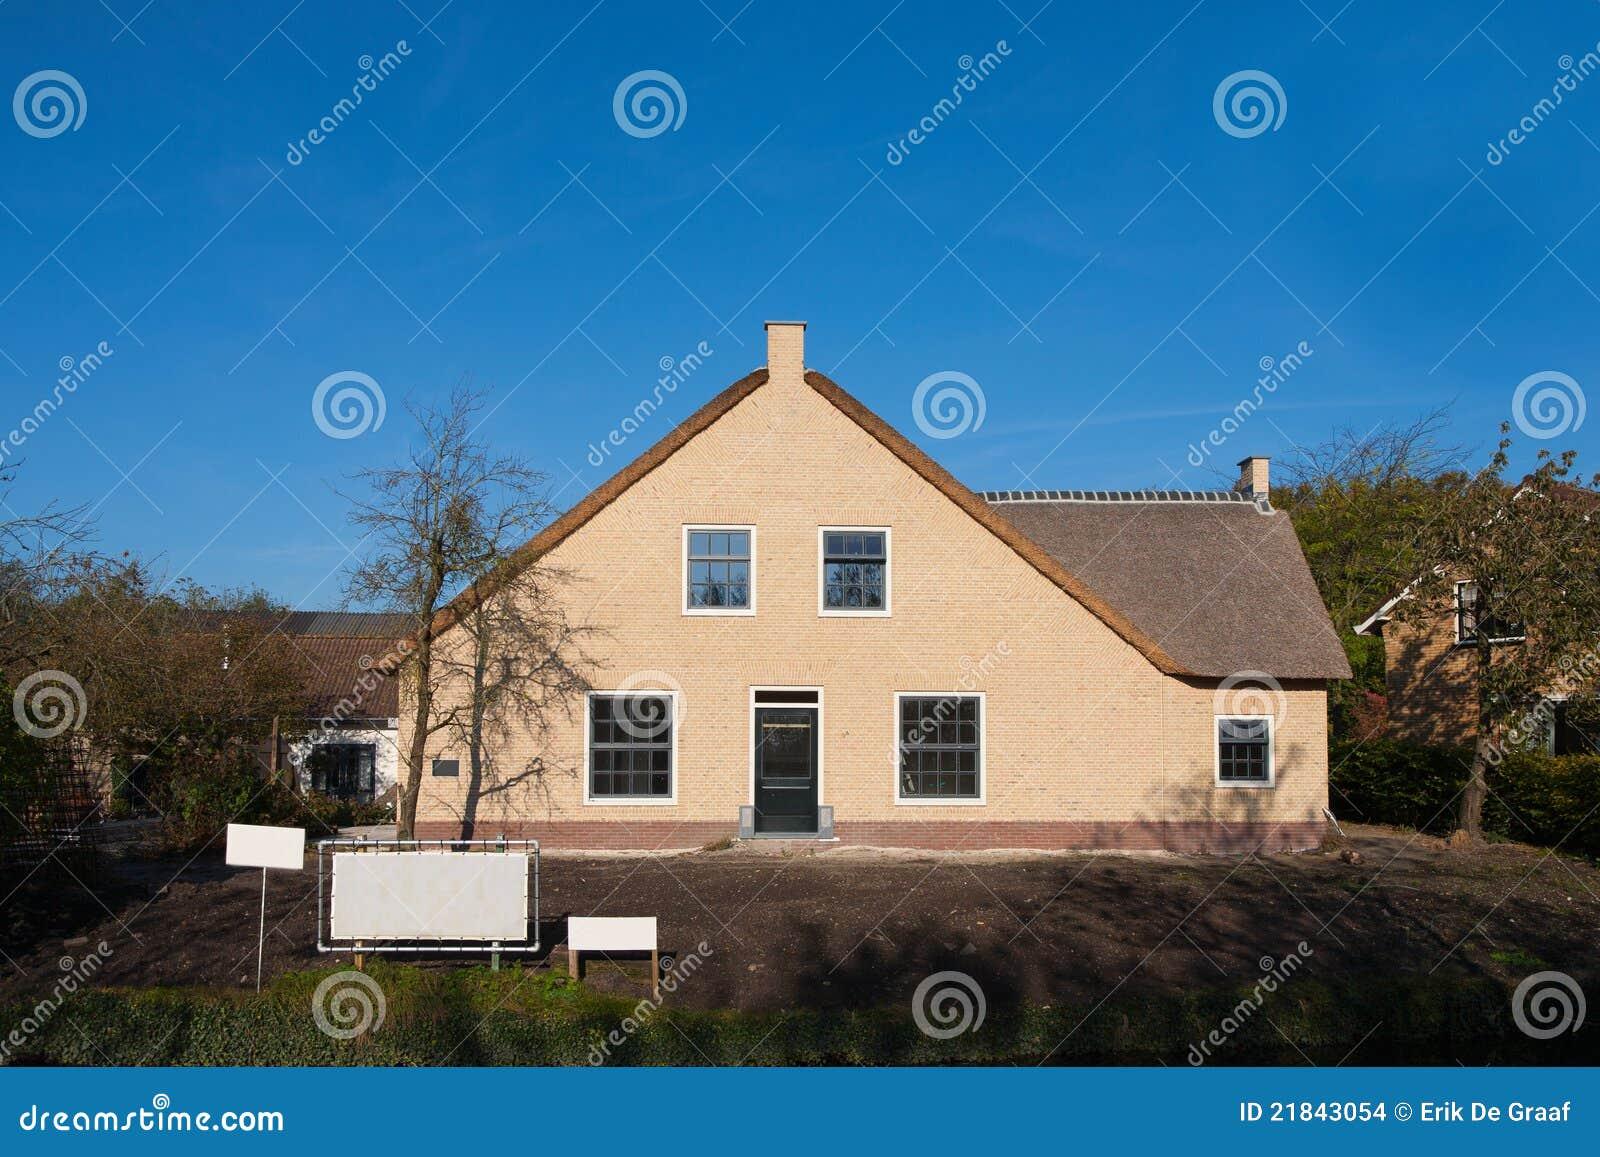 Dutch farm house stock images image 21843054 for Farm house netherlands